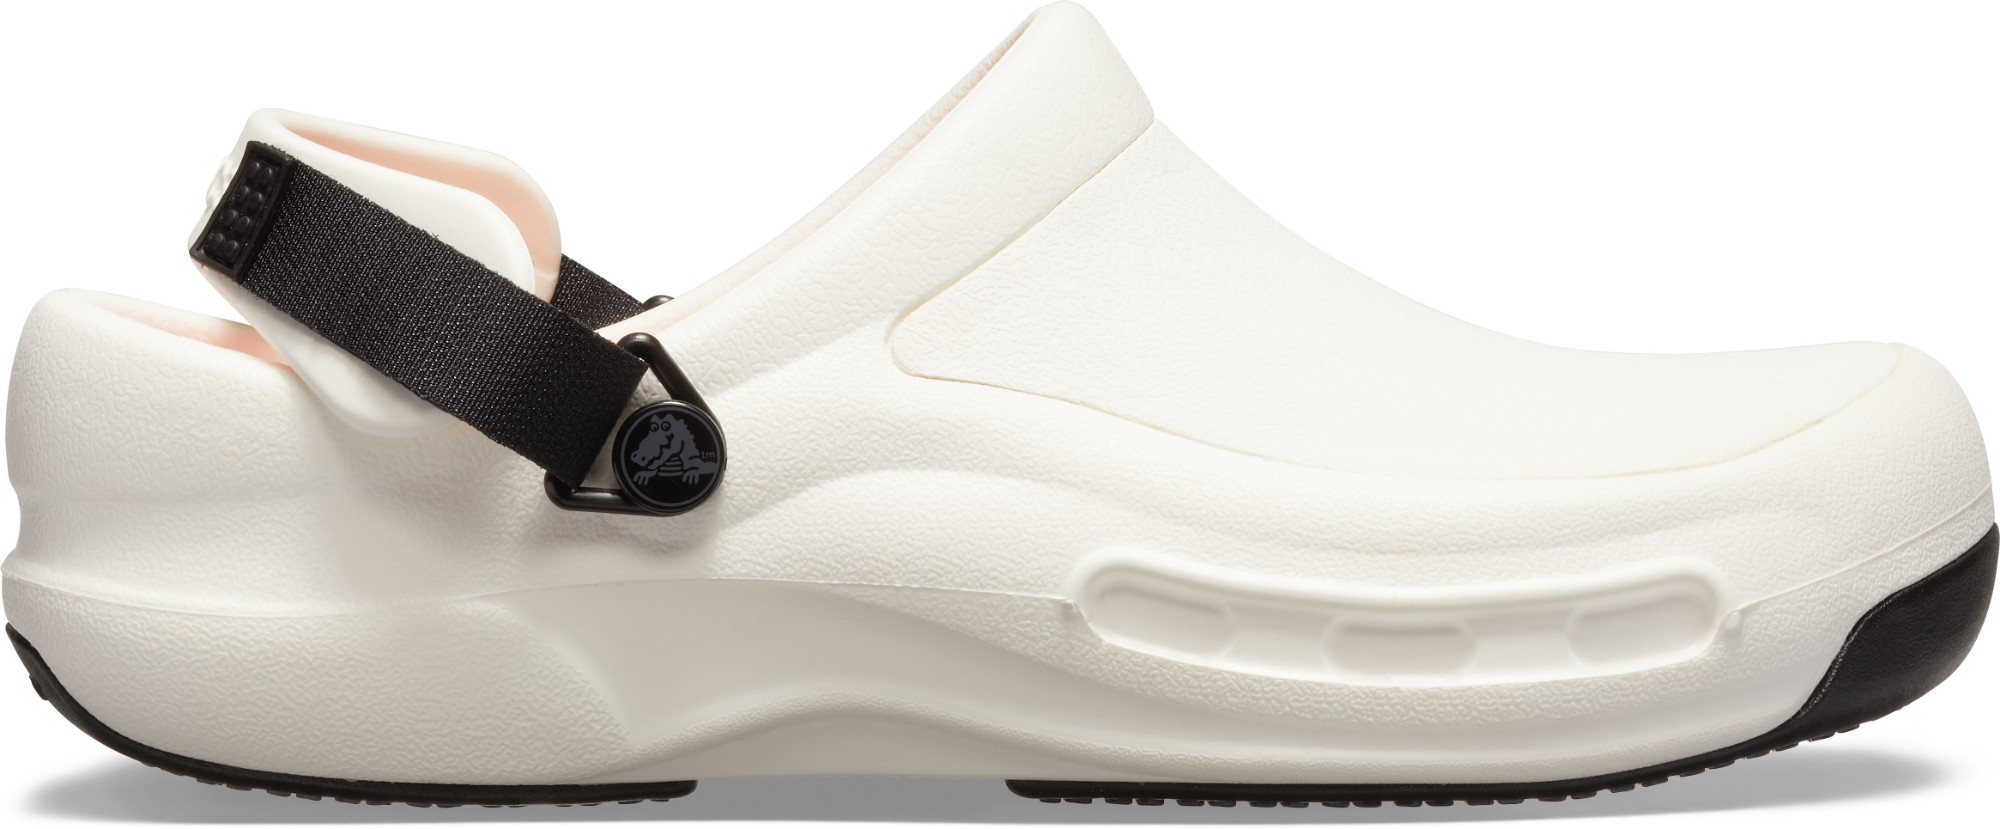 Crocs™ Bistro Pro LiteRide Clog White 37,5